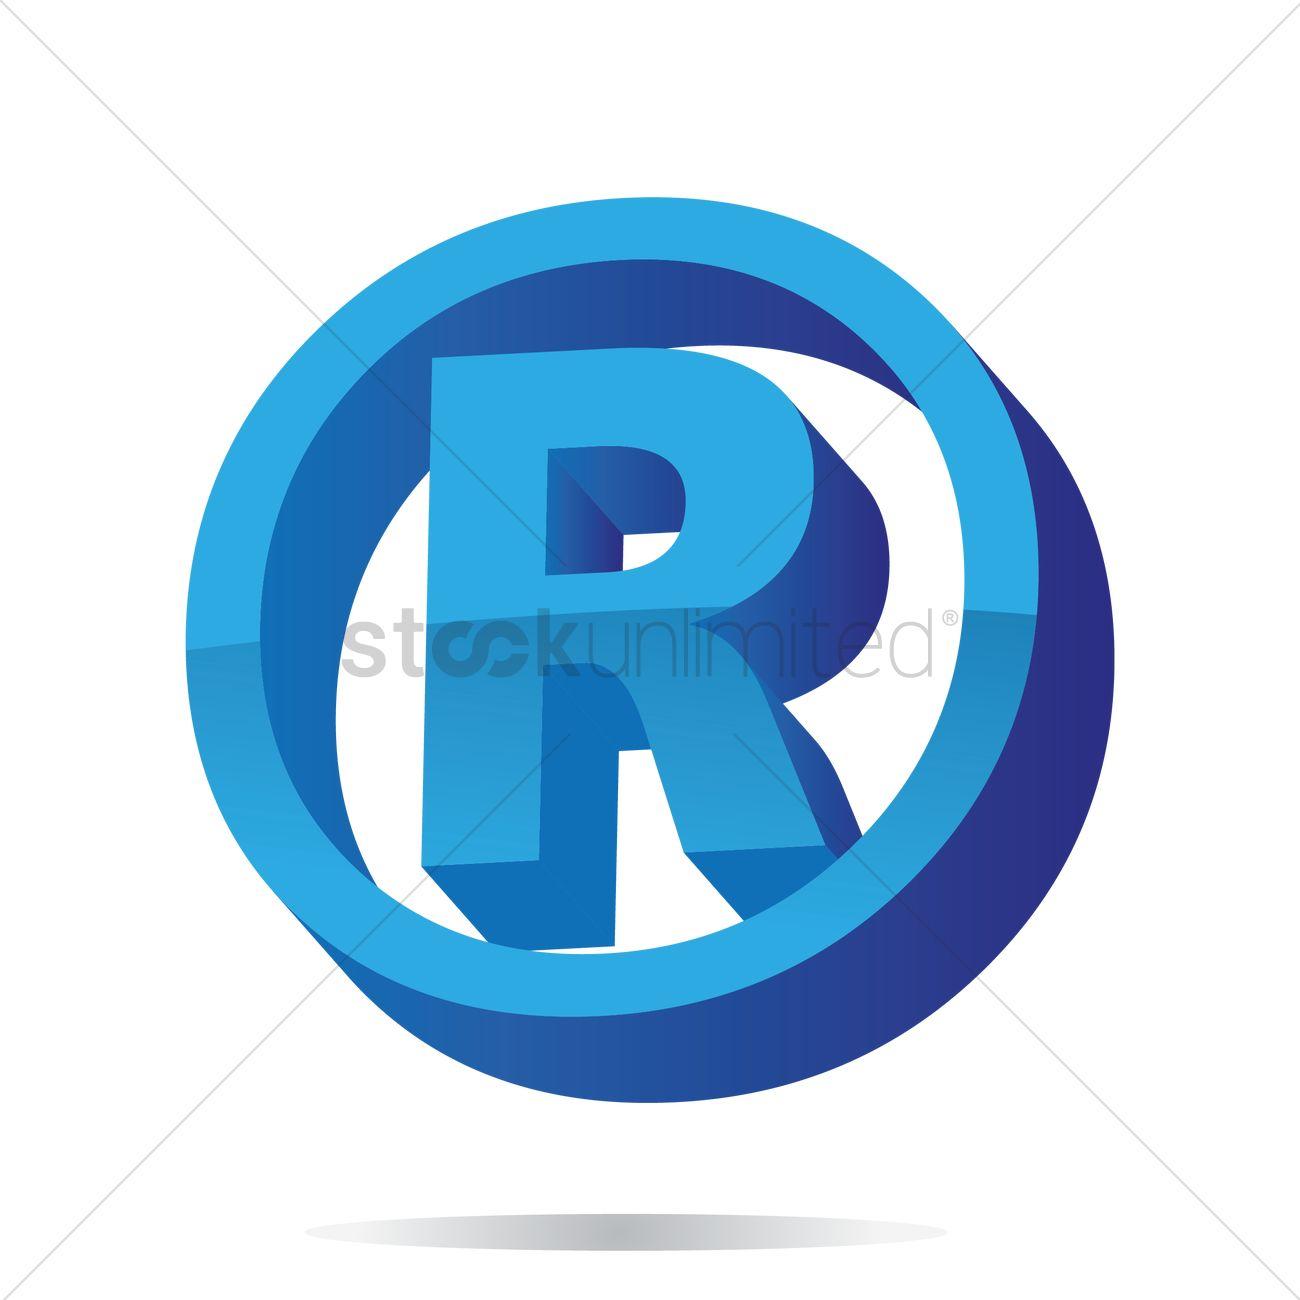 Registered trademark symbol vector image 1632168 stockunlimited registered trademark symbol vector graphic biocorpaavc Gallery